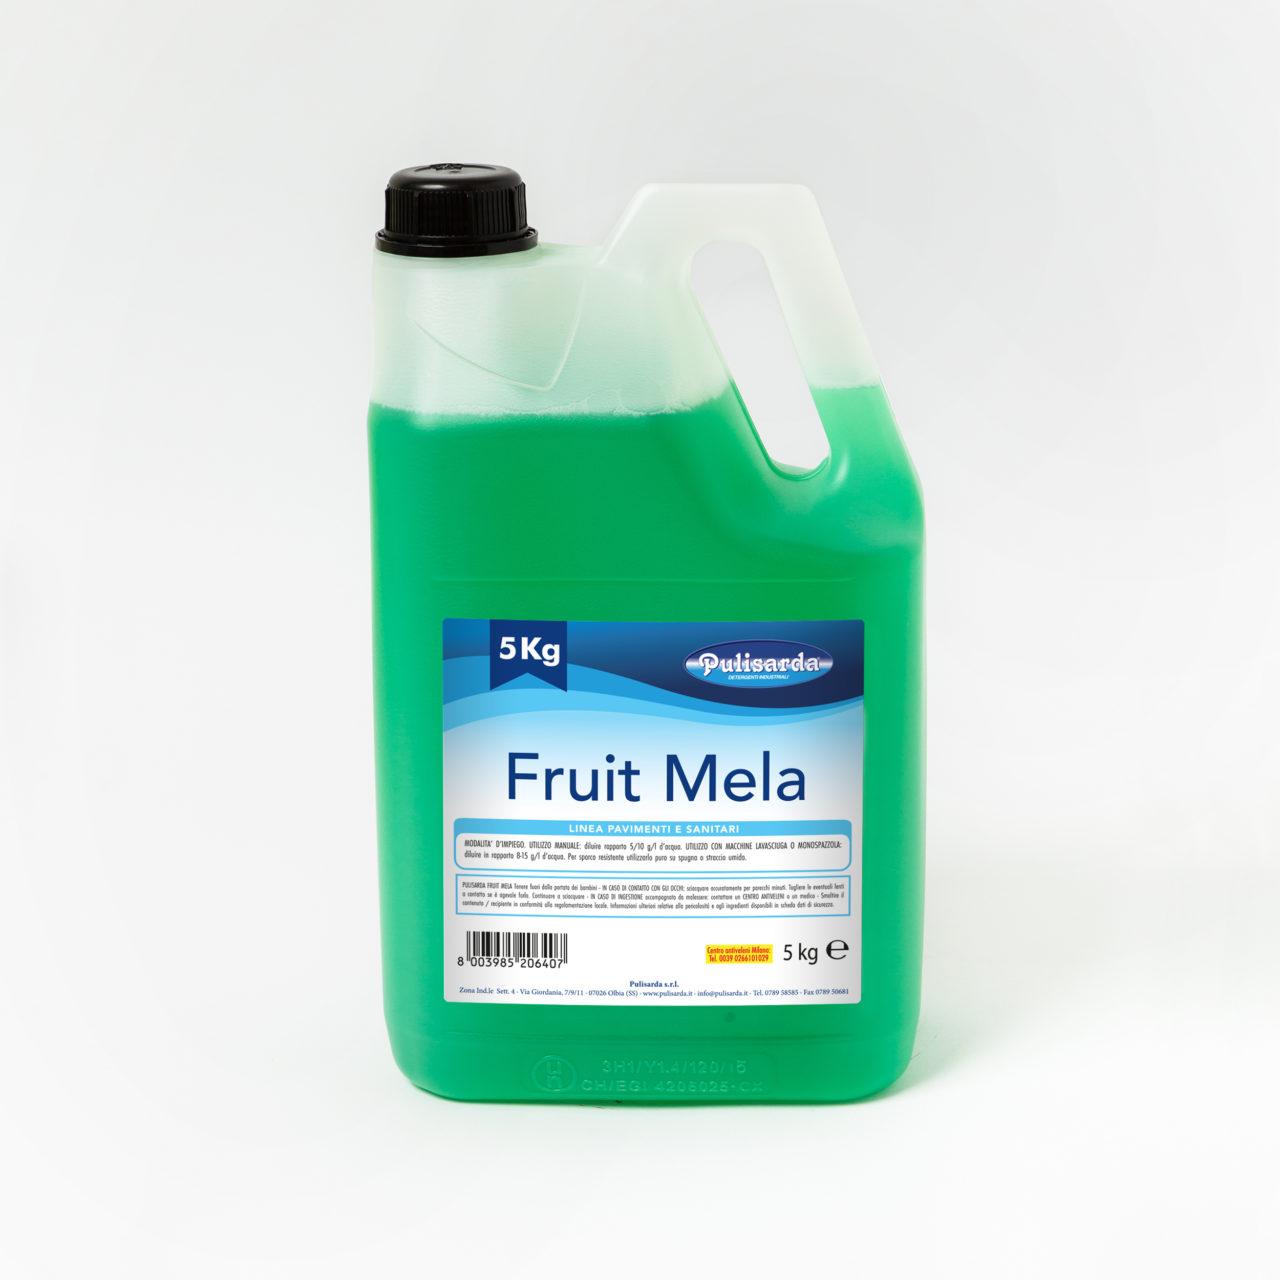 Fruit Mela